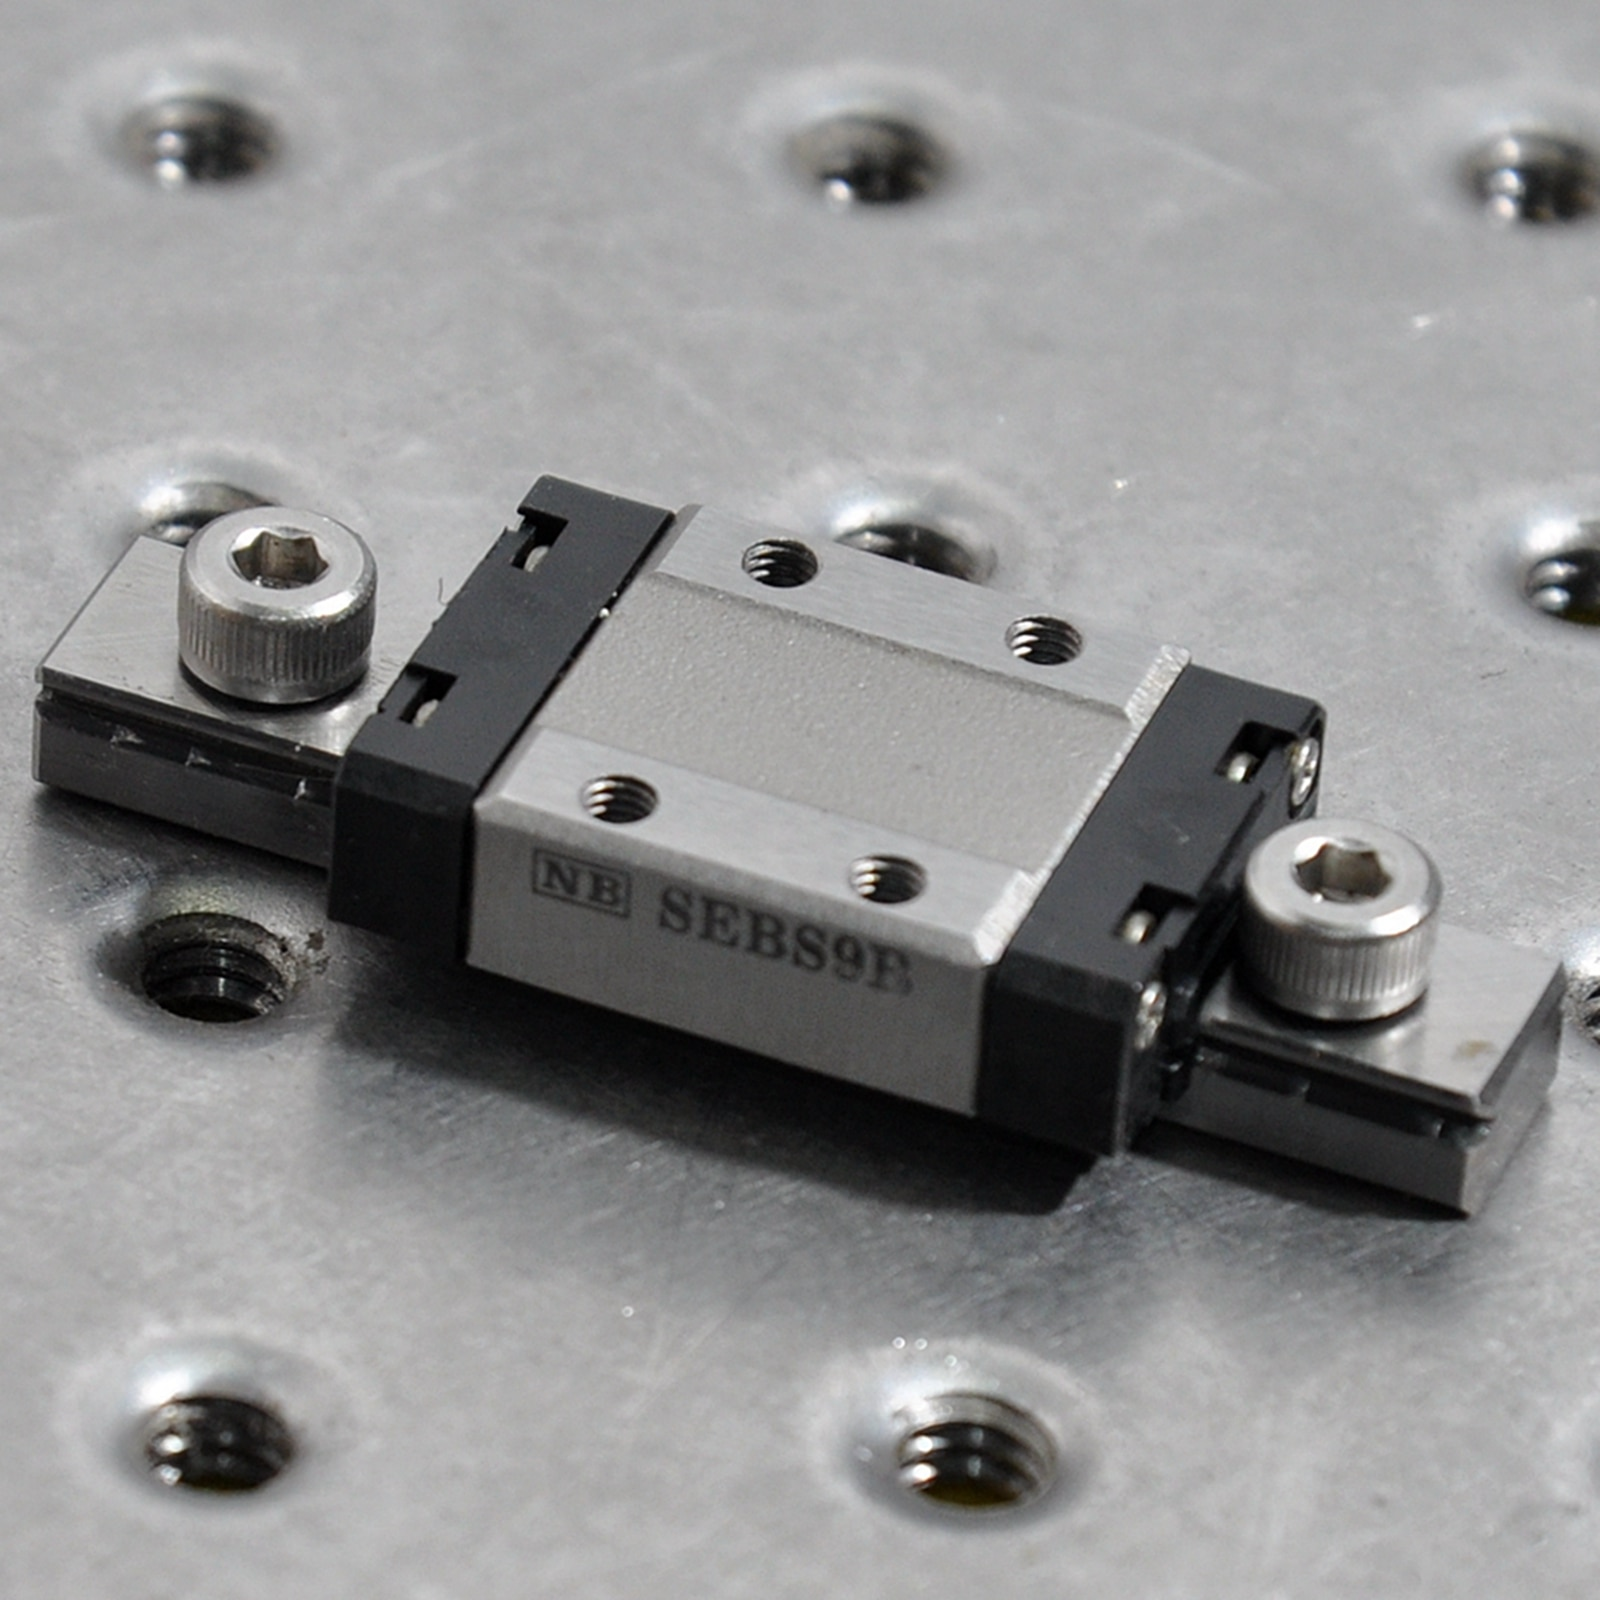 NB Japan SEBS9B small precision slider sliding table miniature pneumatic rail slider 20*30mm enlarge